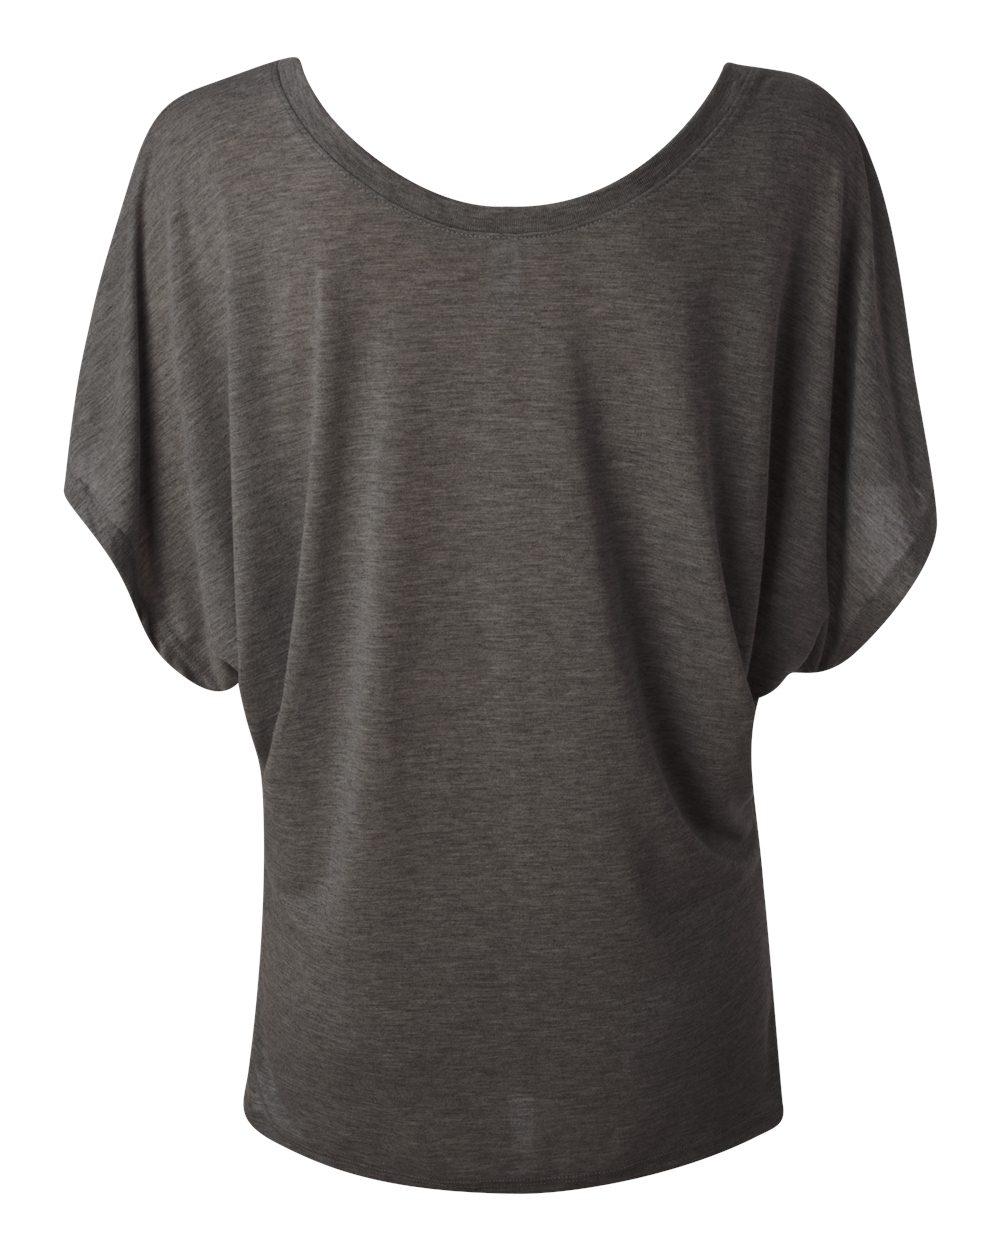 Bella-Canvas-Women-039-s-Flowy-Draped-Sleeve-Dolman-T-Shirt-8821-S-2XL thumbnail 22